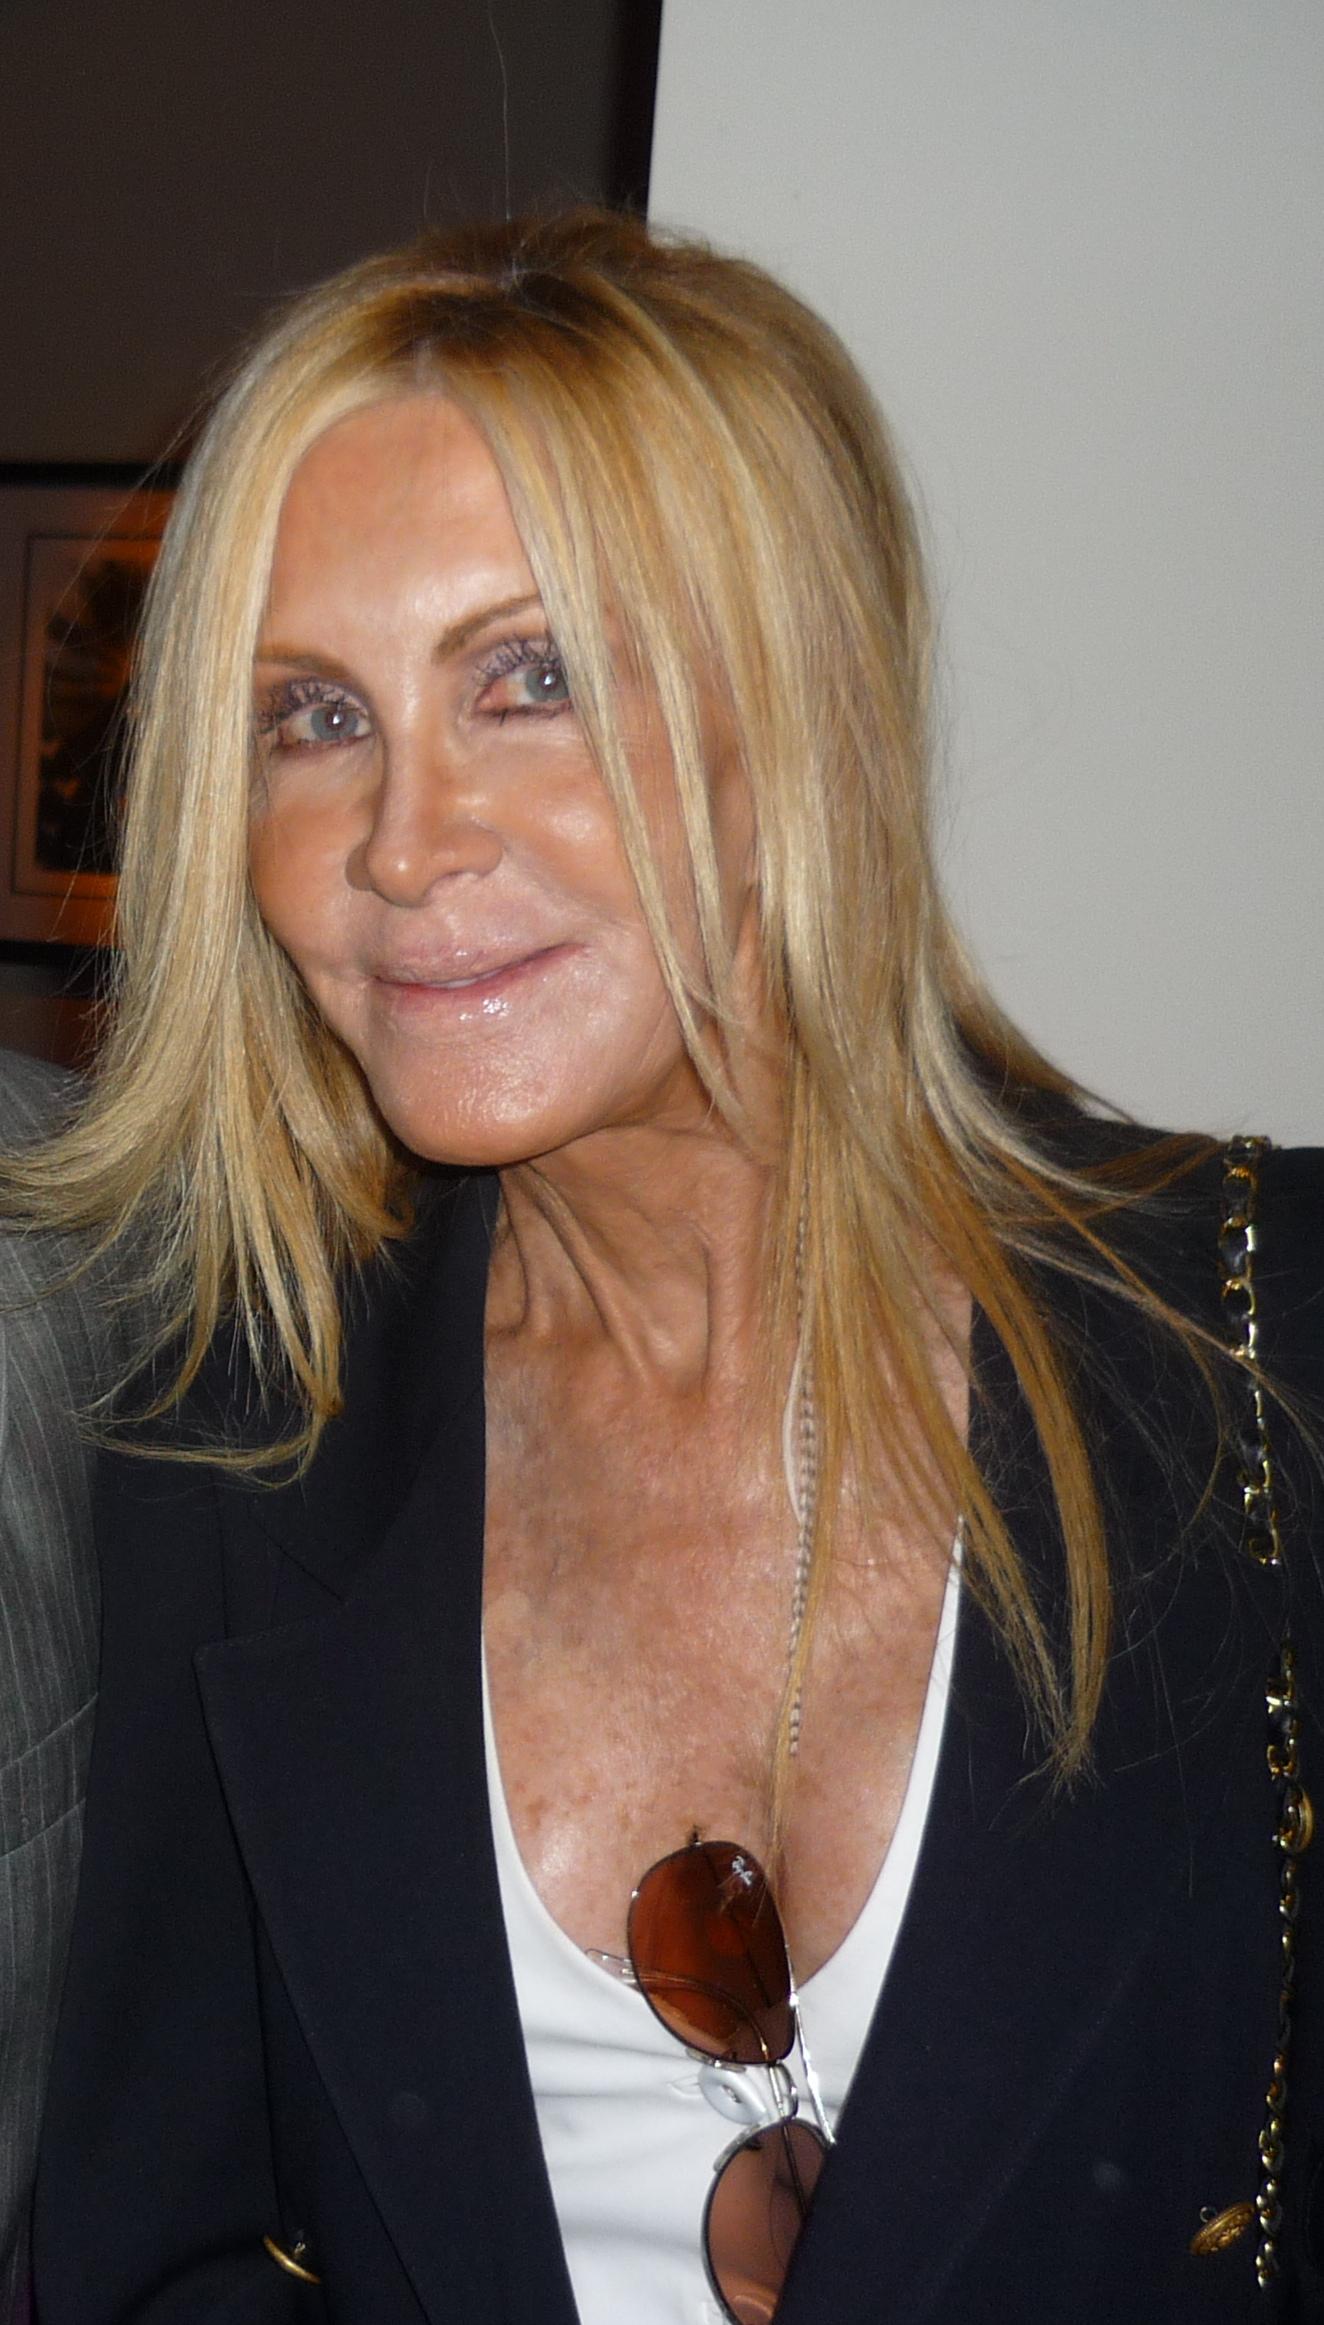 Joan Van Ark nude photos 2019